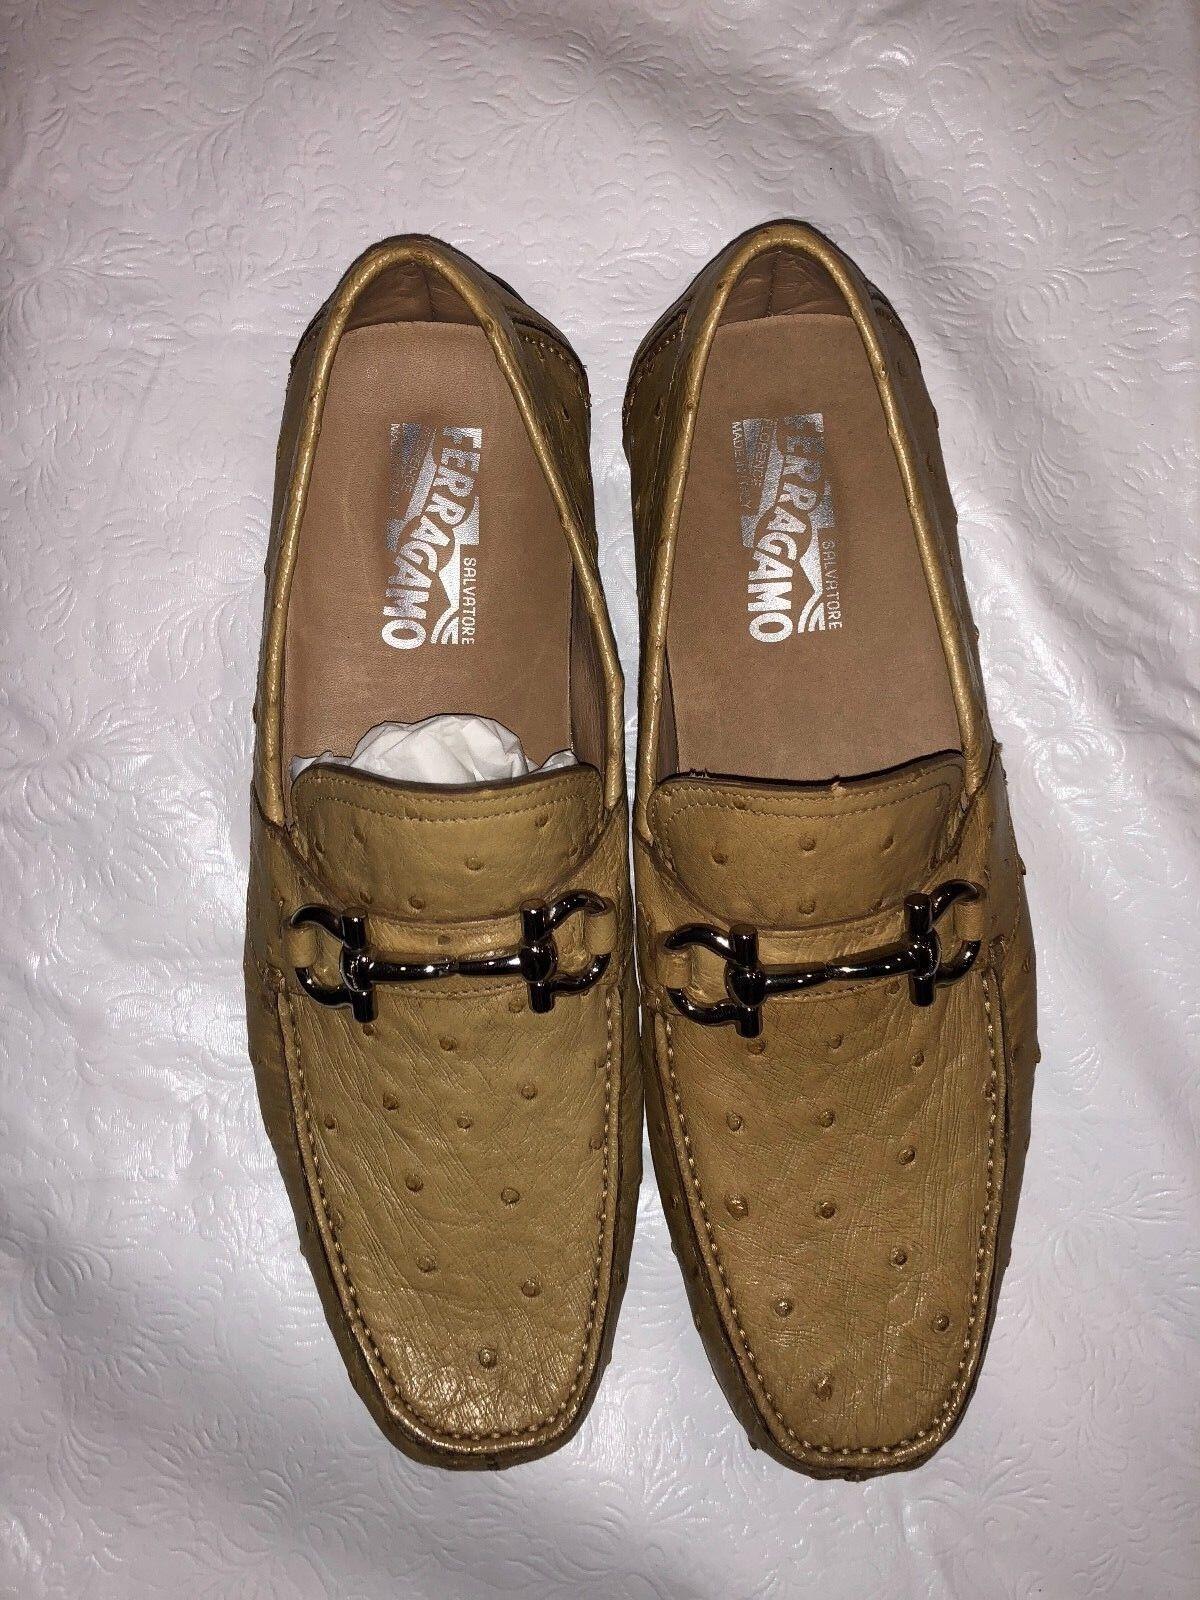 Men's Salvatore Ferragamo Parigi MTO Dress shoes